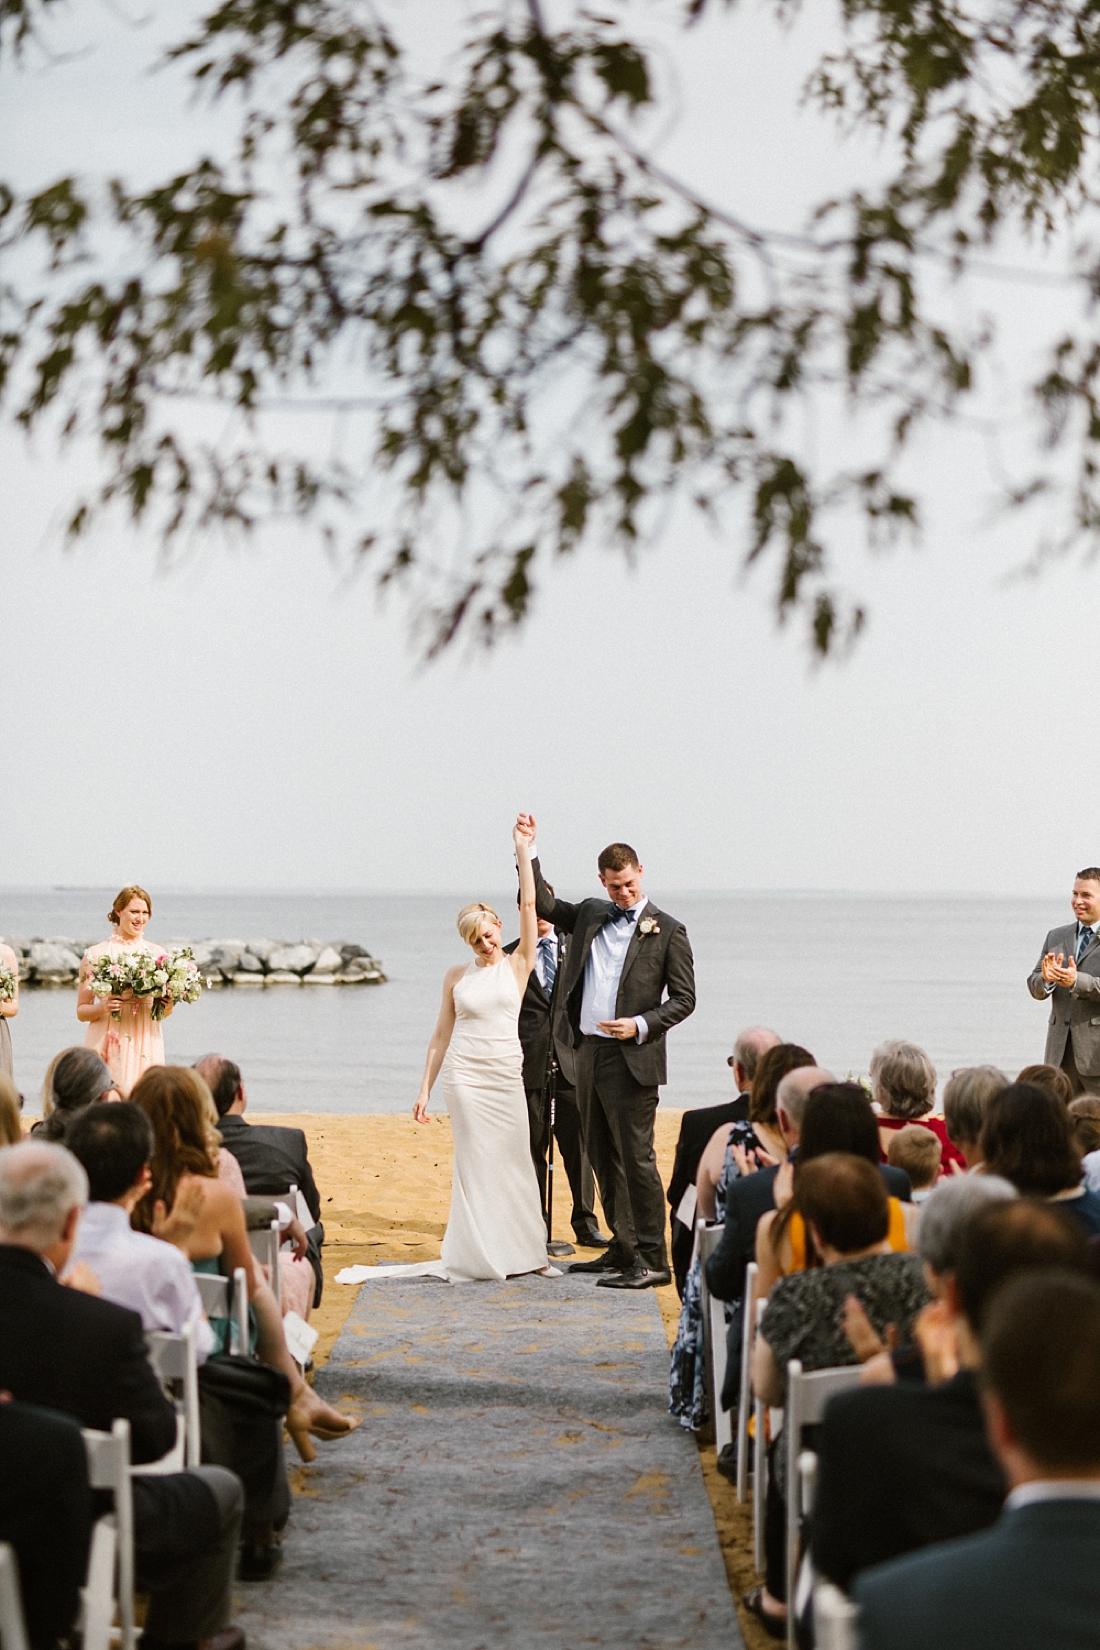 Marryland Weddings Earthy Neutrals Wedding at Chesapeake Bay Foundation Victoria Selman Photography_1007.jpg